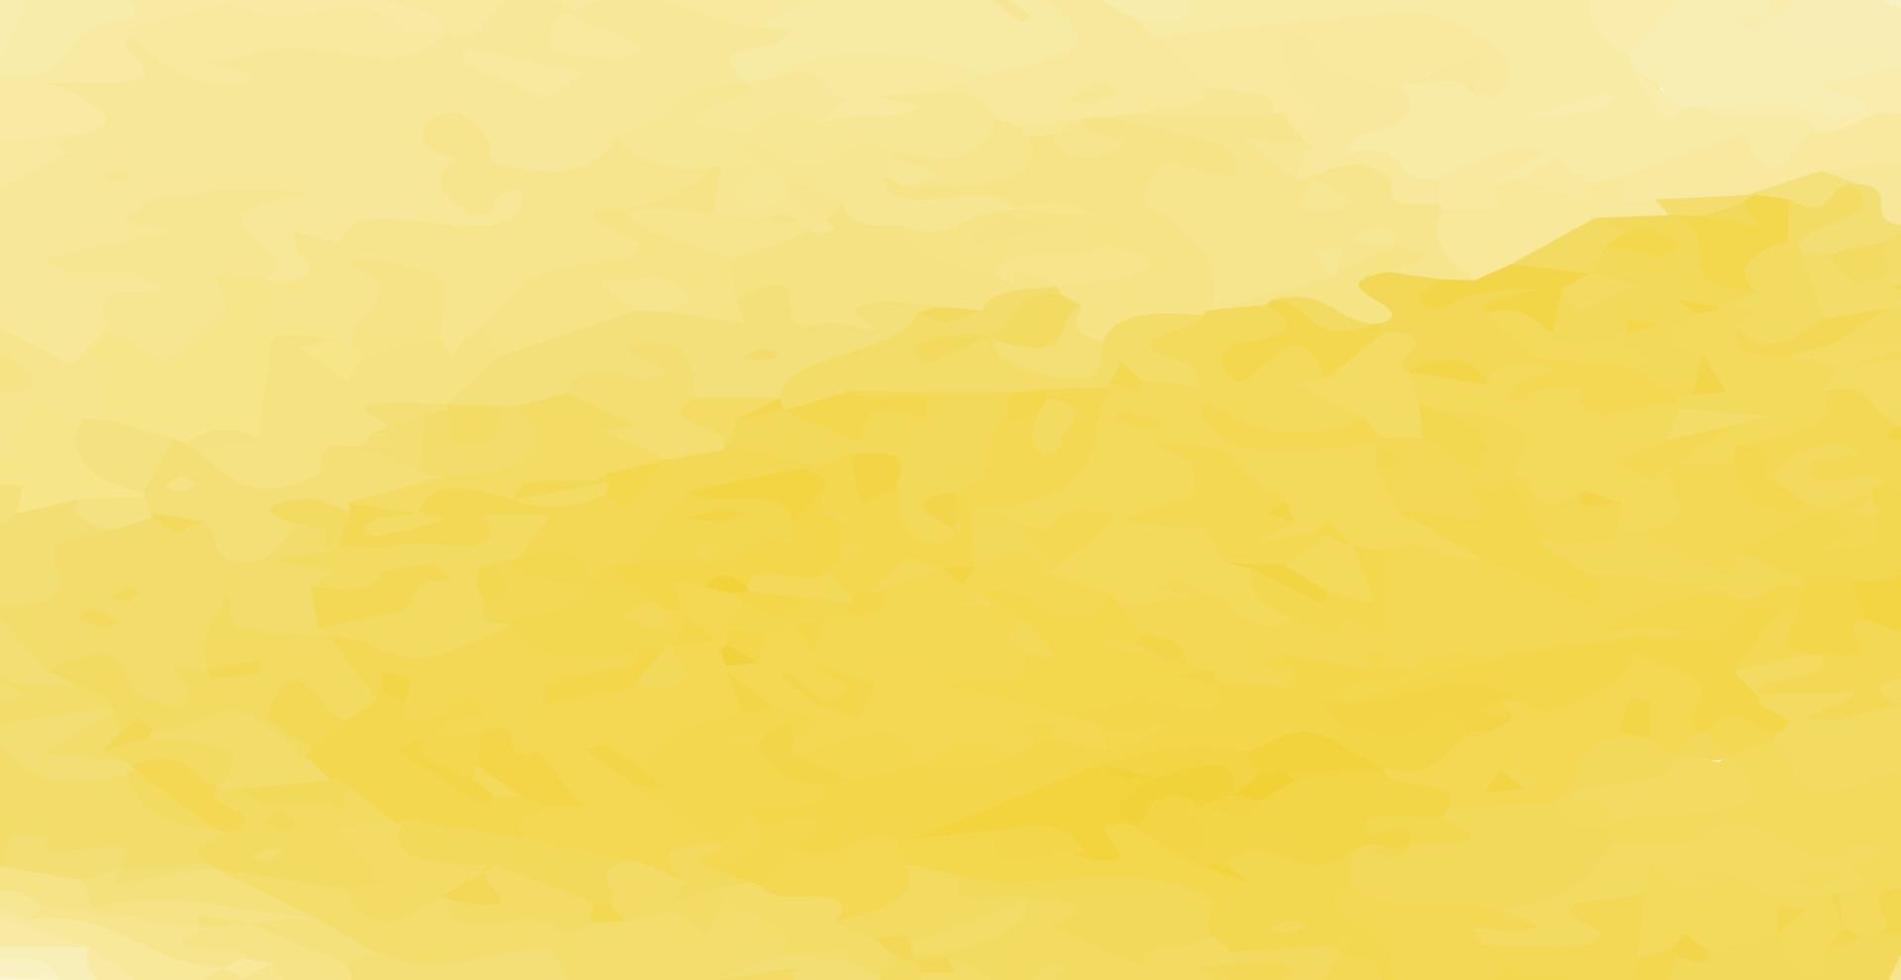 realista amarelo-laranja pintado em aquarela abstrato vetor